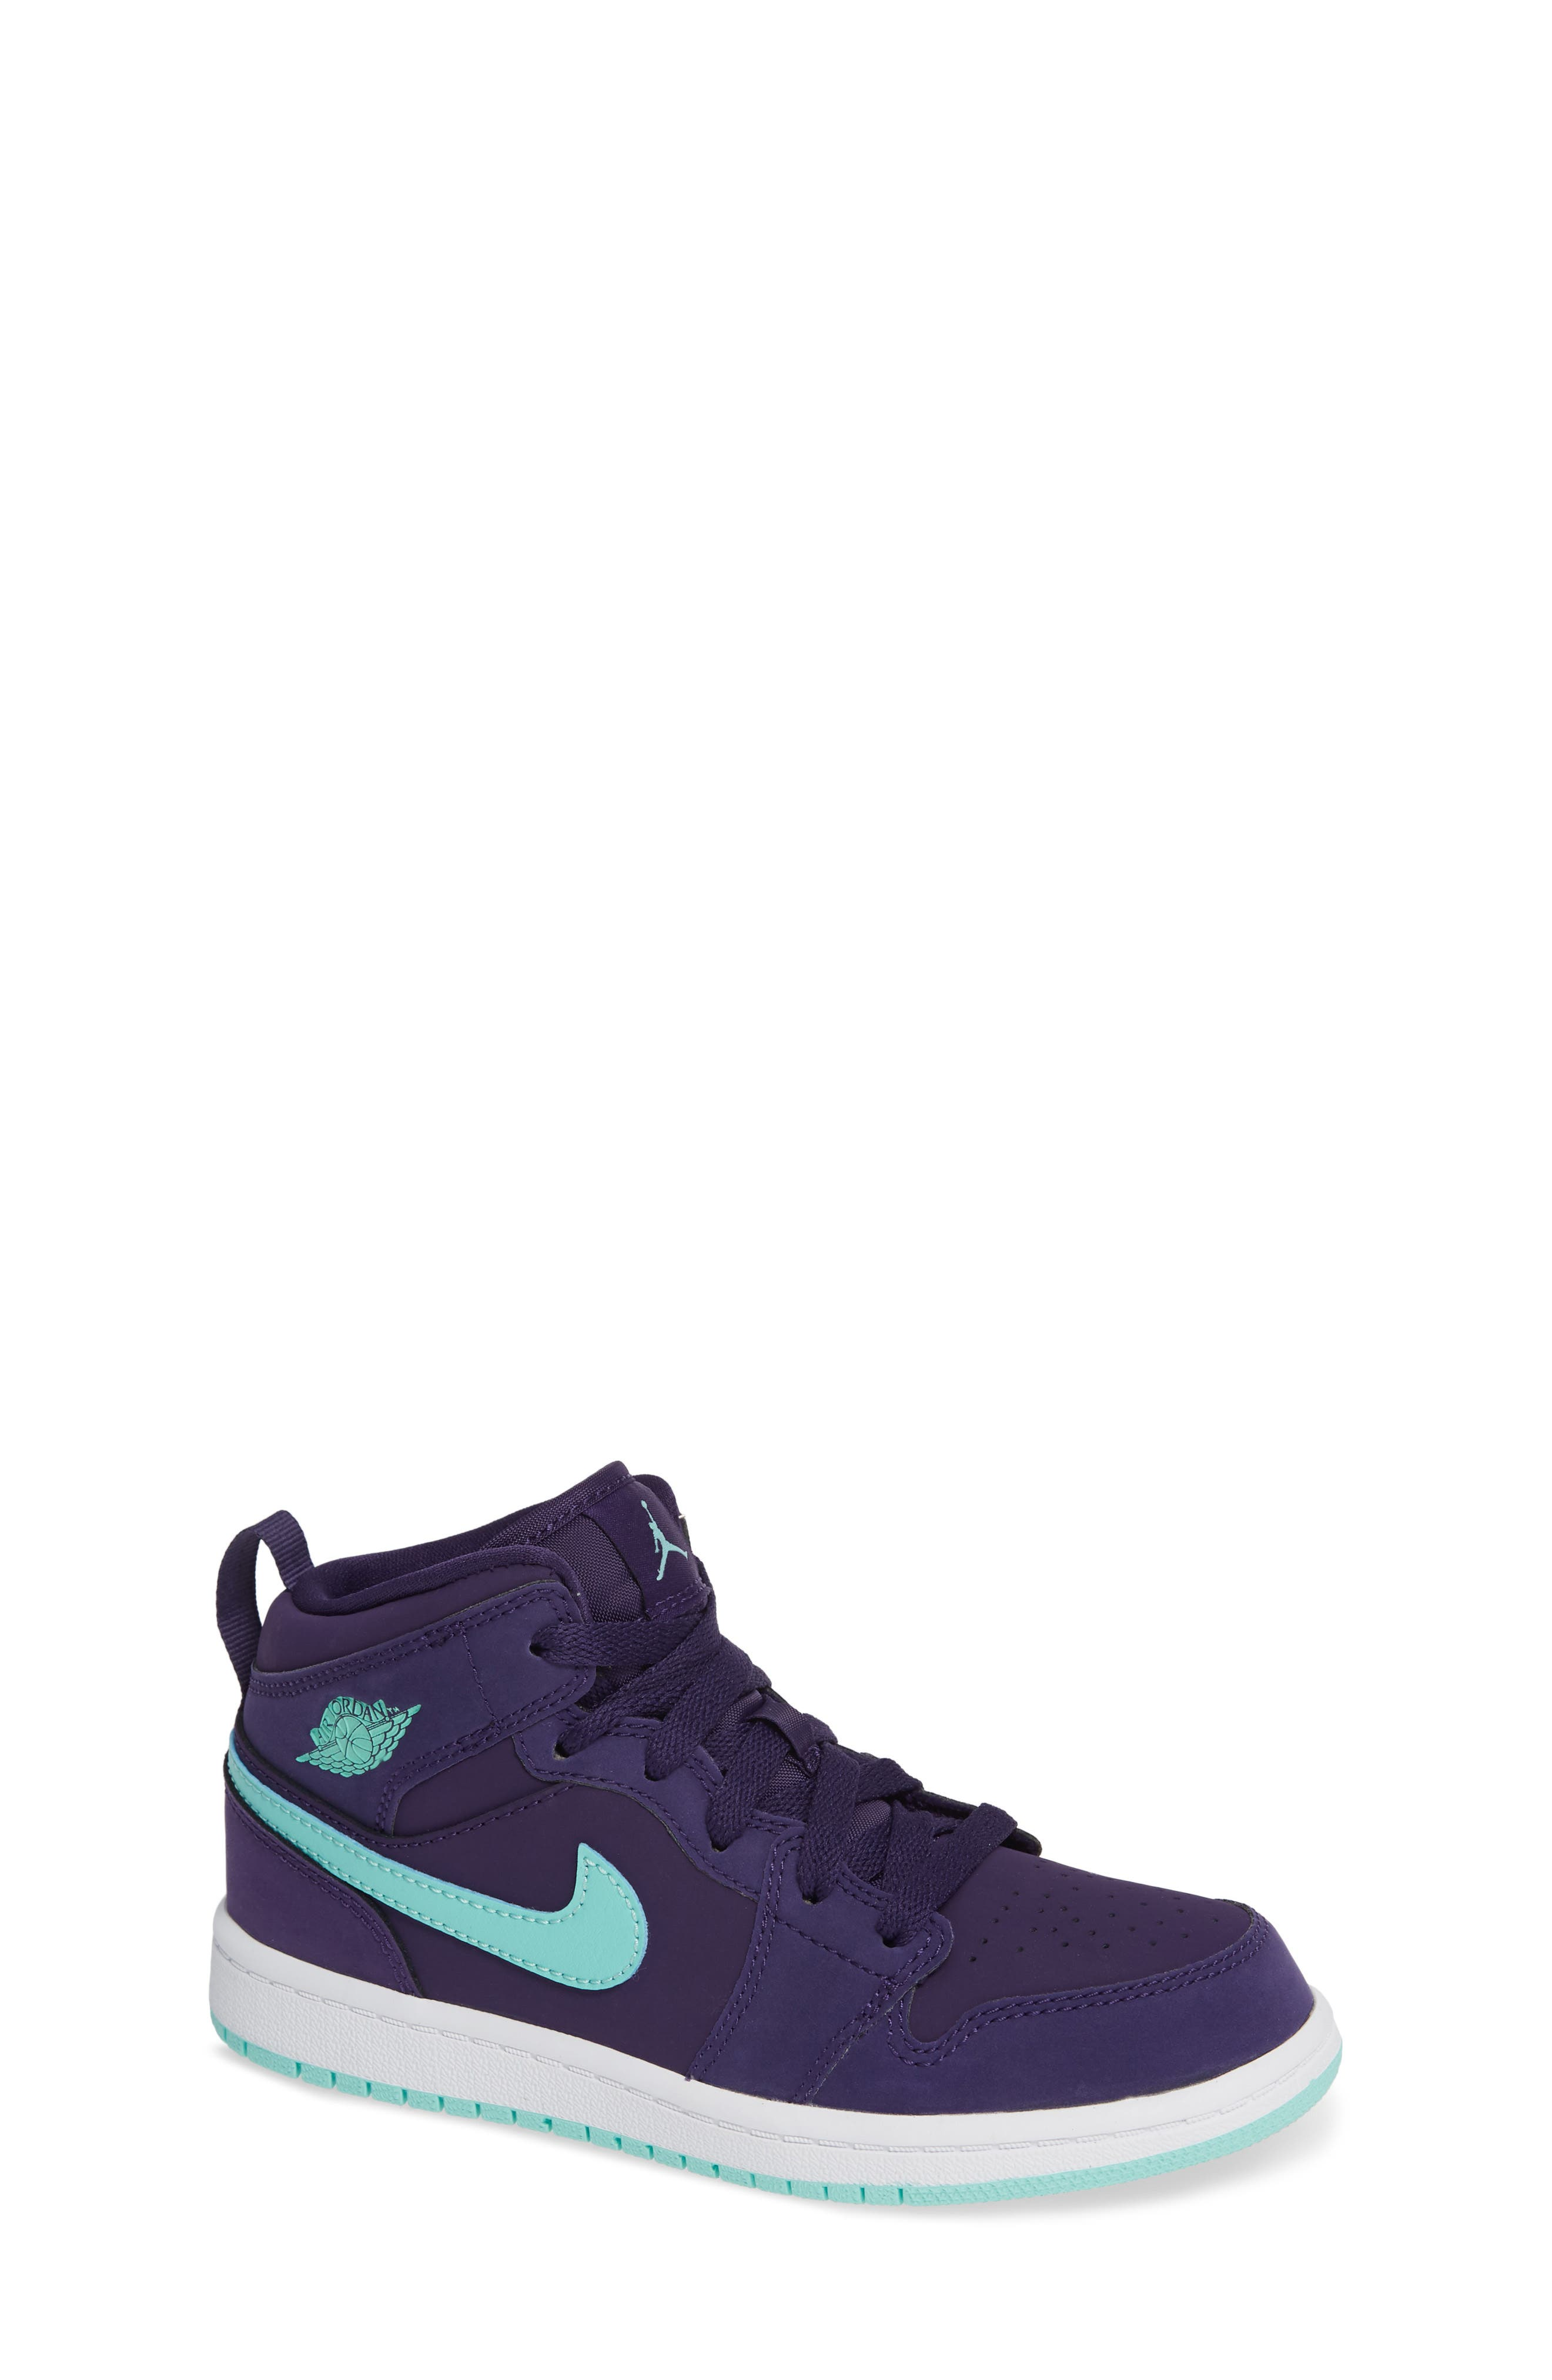 Nike 'Jordan 1 Mid' Basketball Shoe,                         Main,                         color, INK/ EMERALD RISE/ WHITE